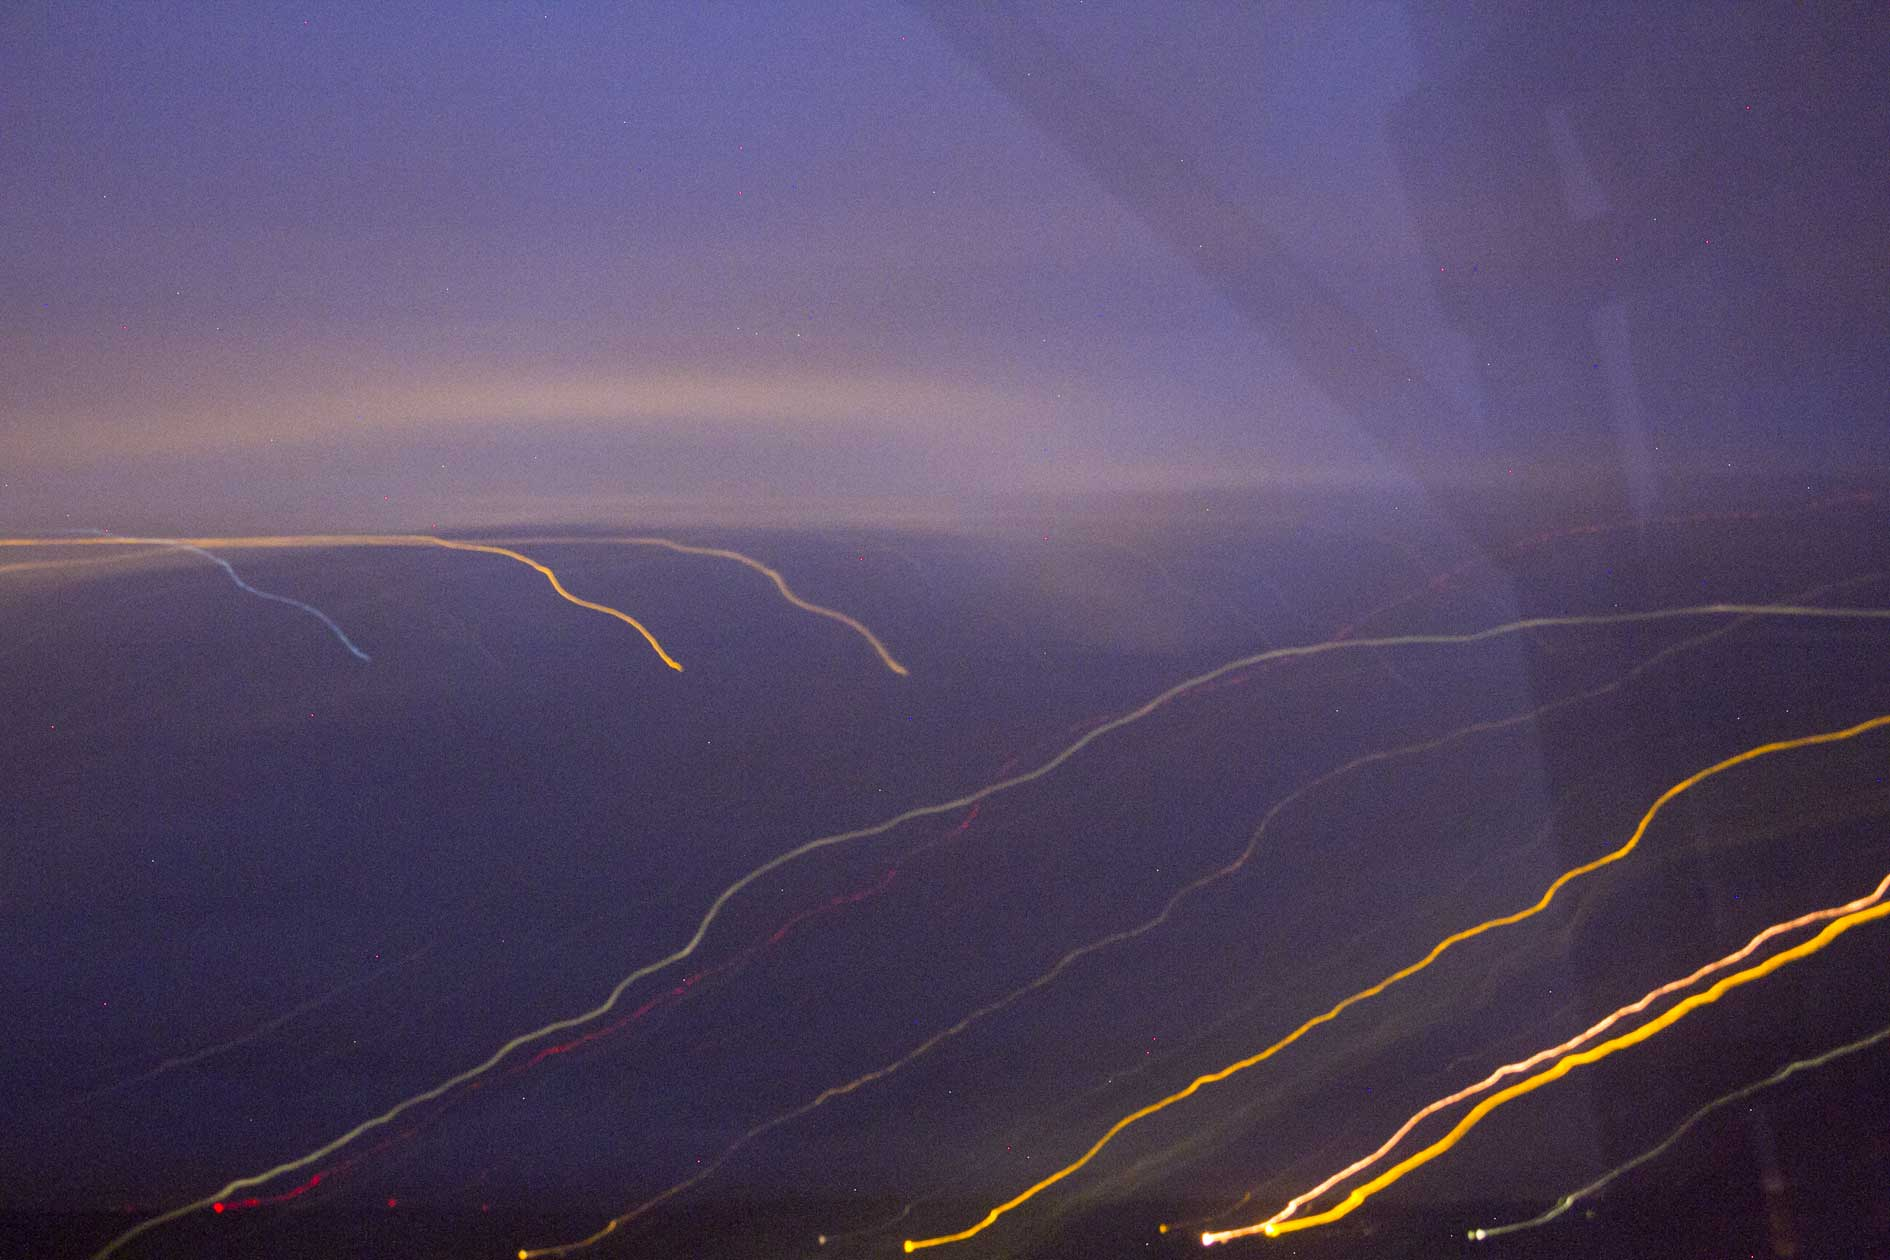 aurora-and-light-painting-6.jpg